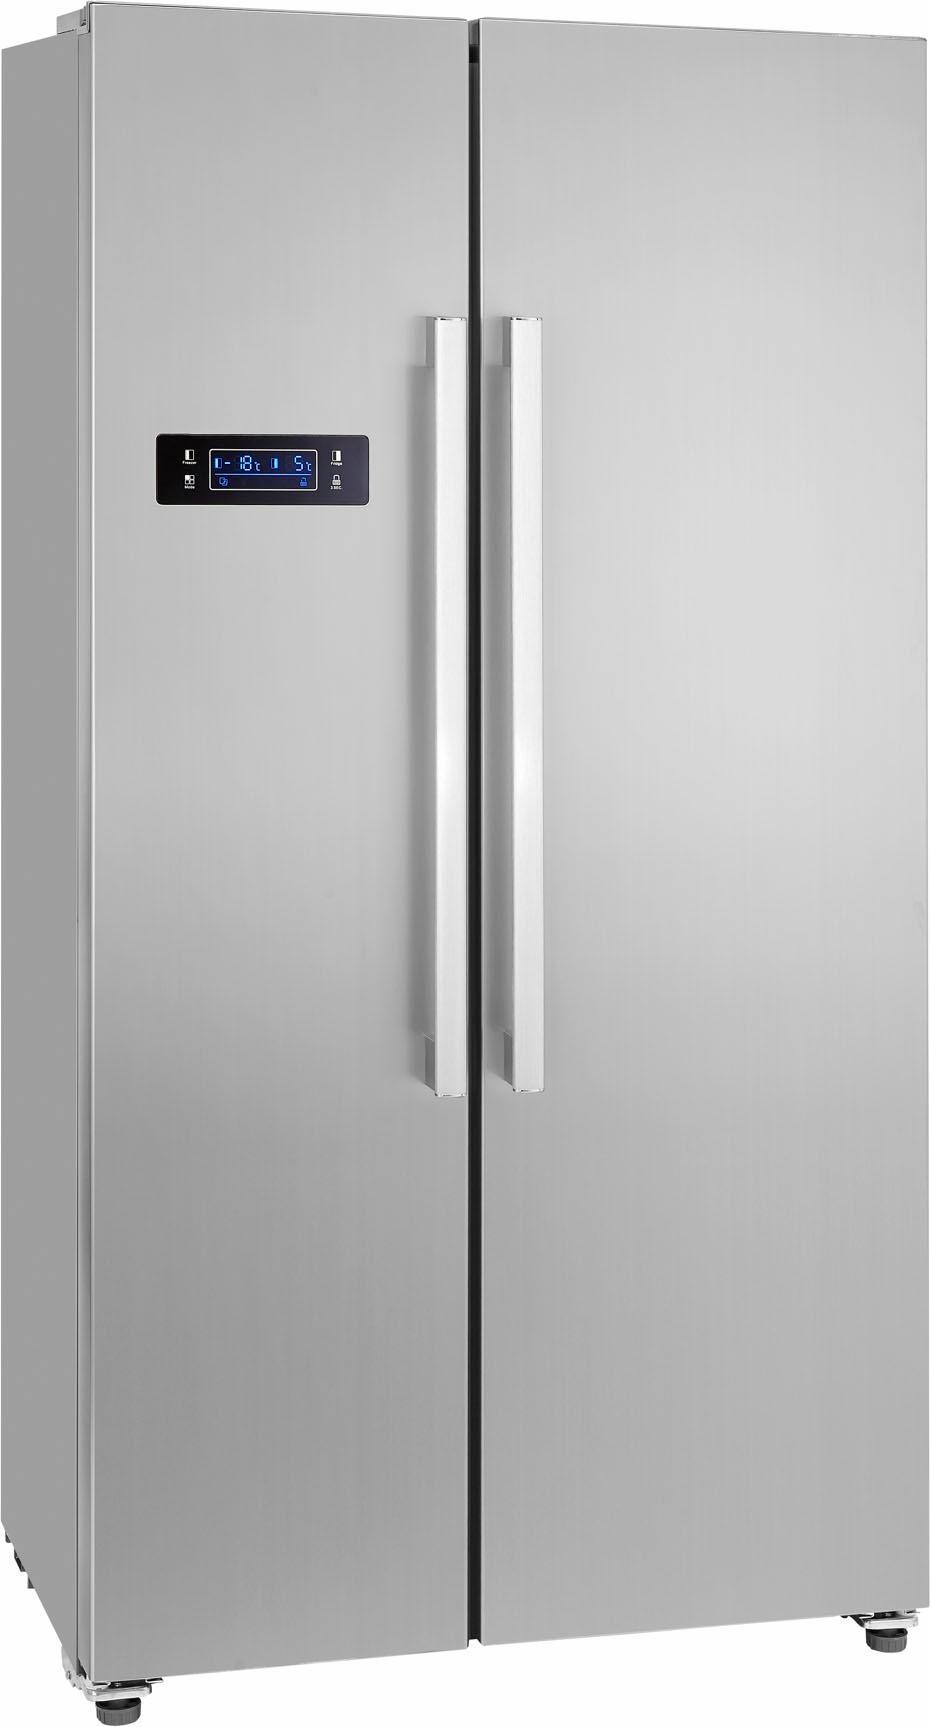 Side By Side Kühlschrank Unter 90 Cm Breit : Side by side kühlschrank auf rechnung raten kaufen